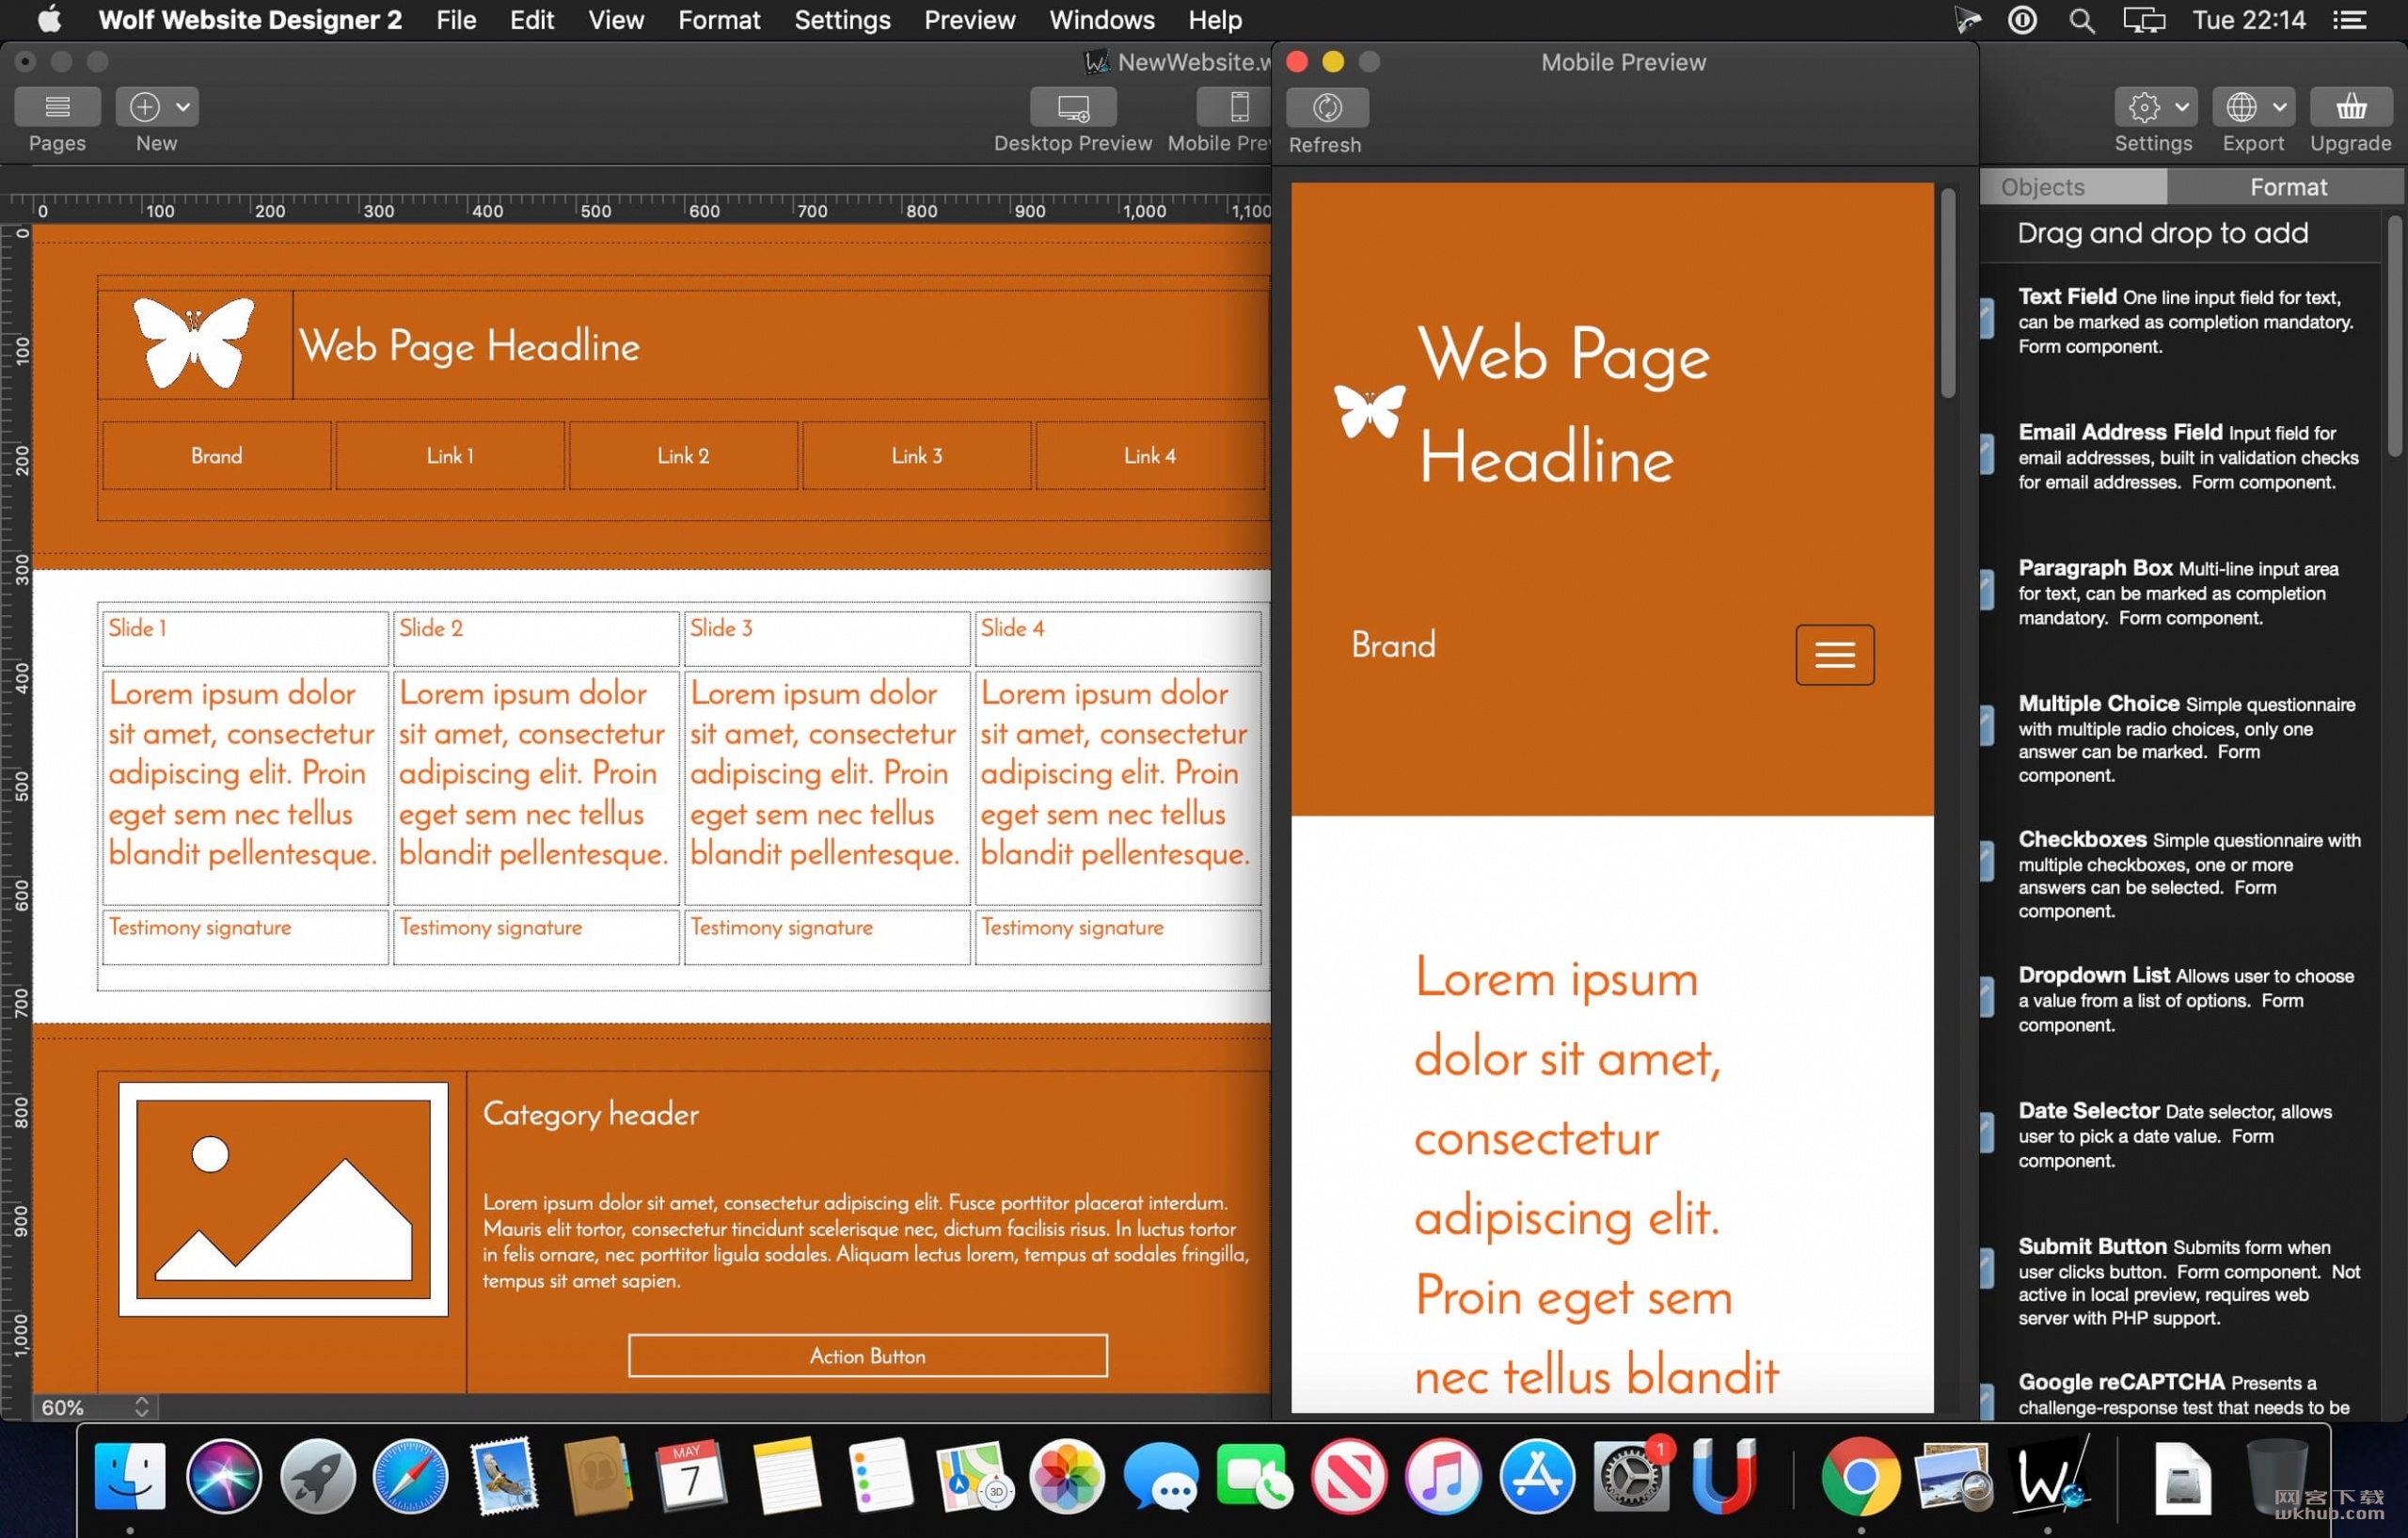 Wolf Responsive Designer Pro 2.30.4 响应式移动网站设计工具